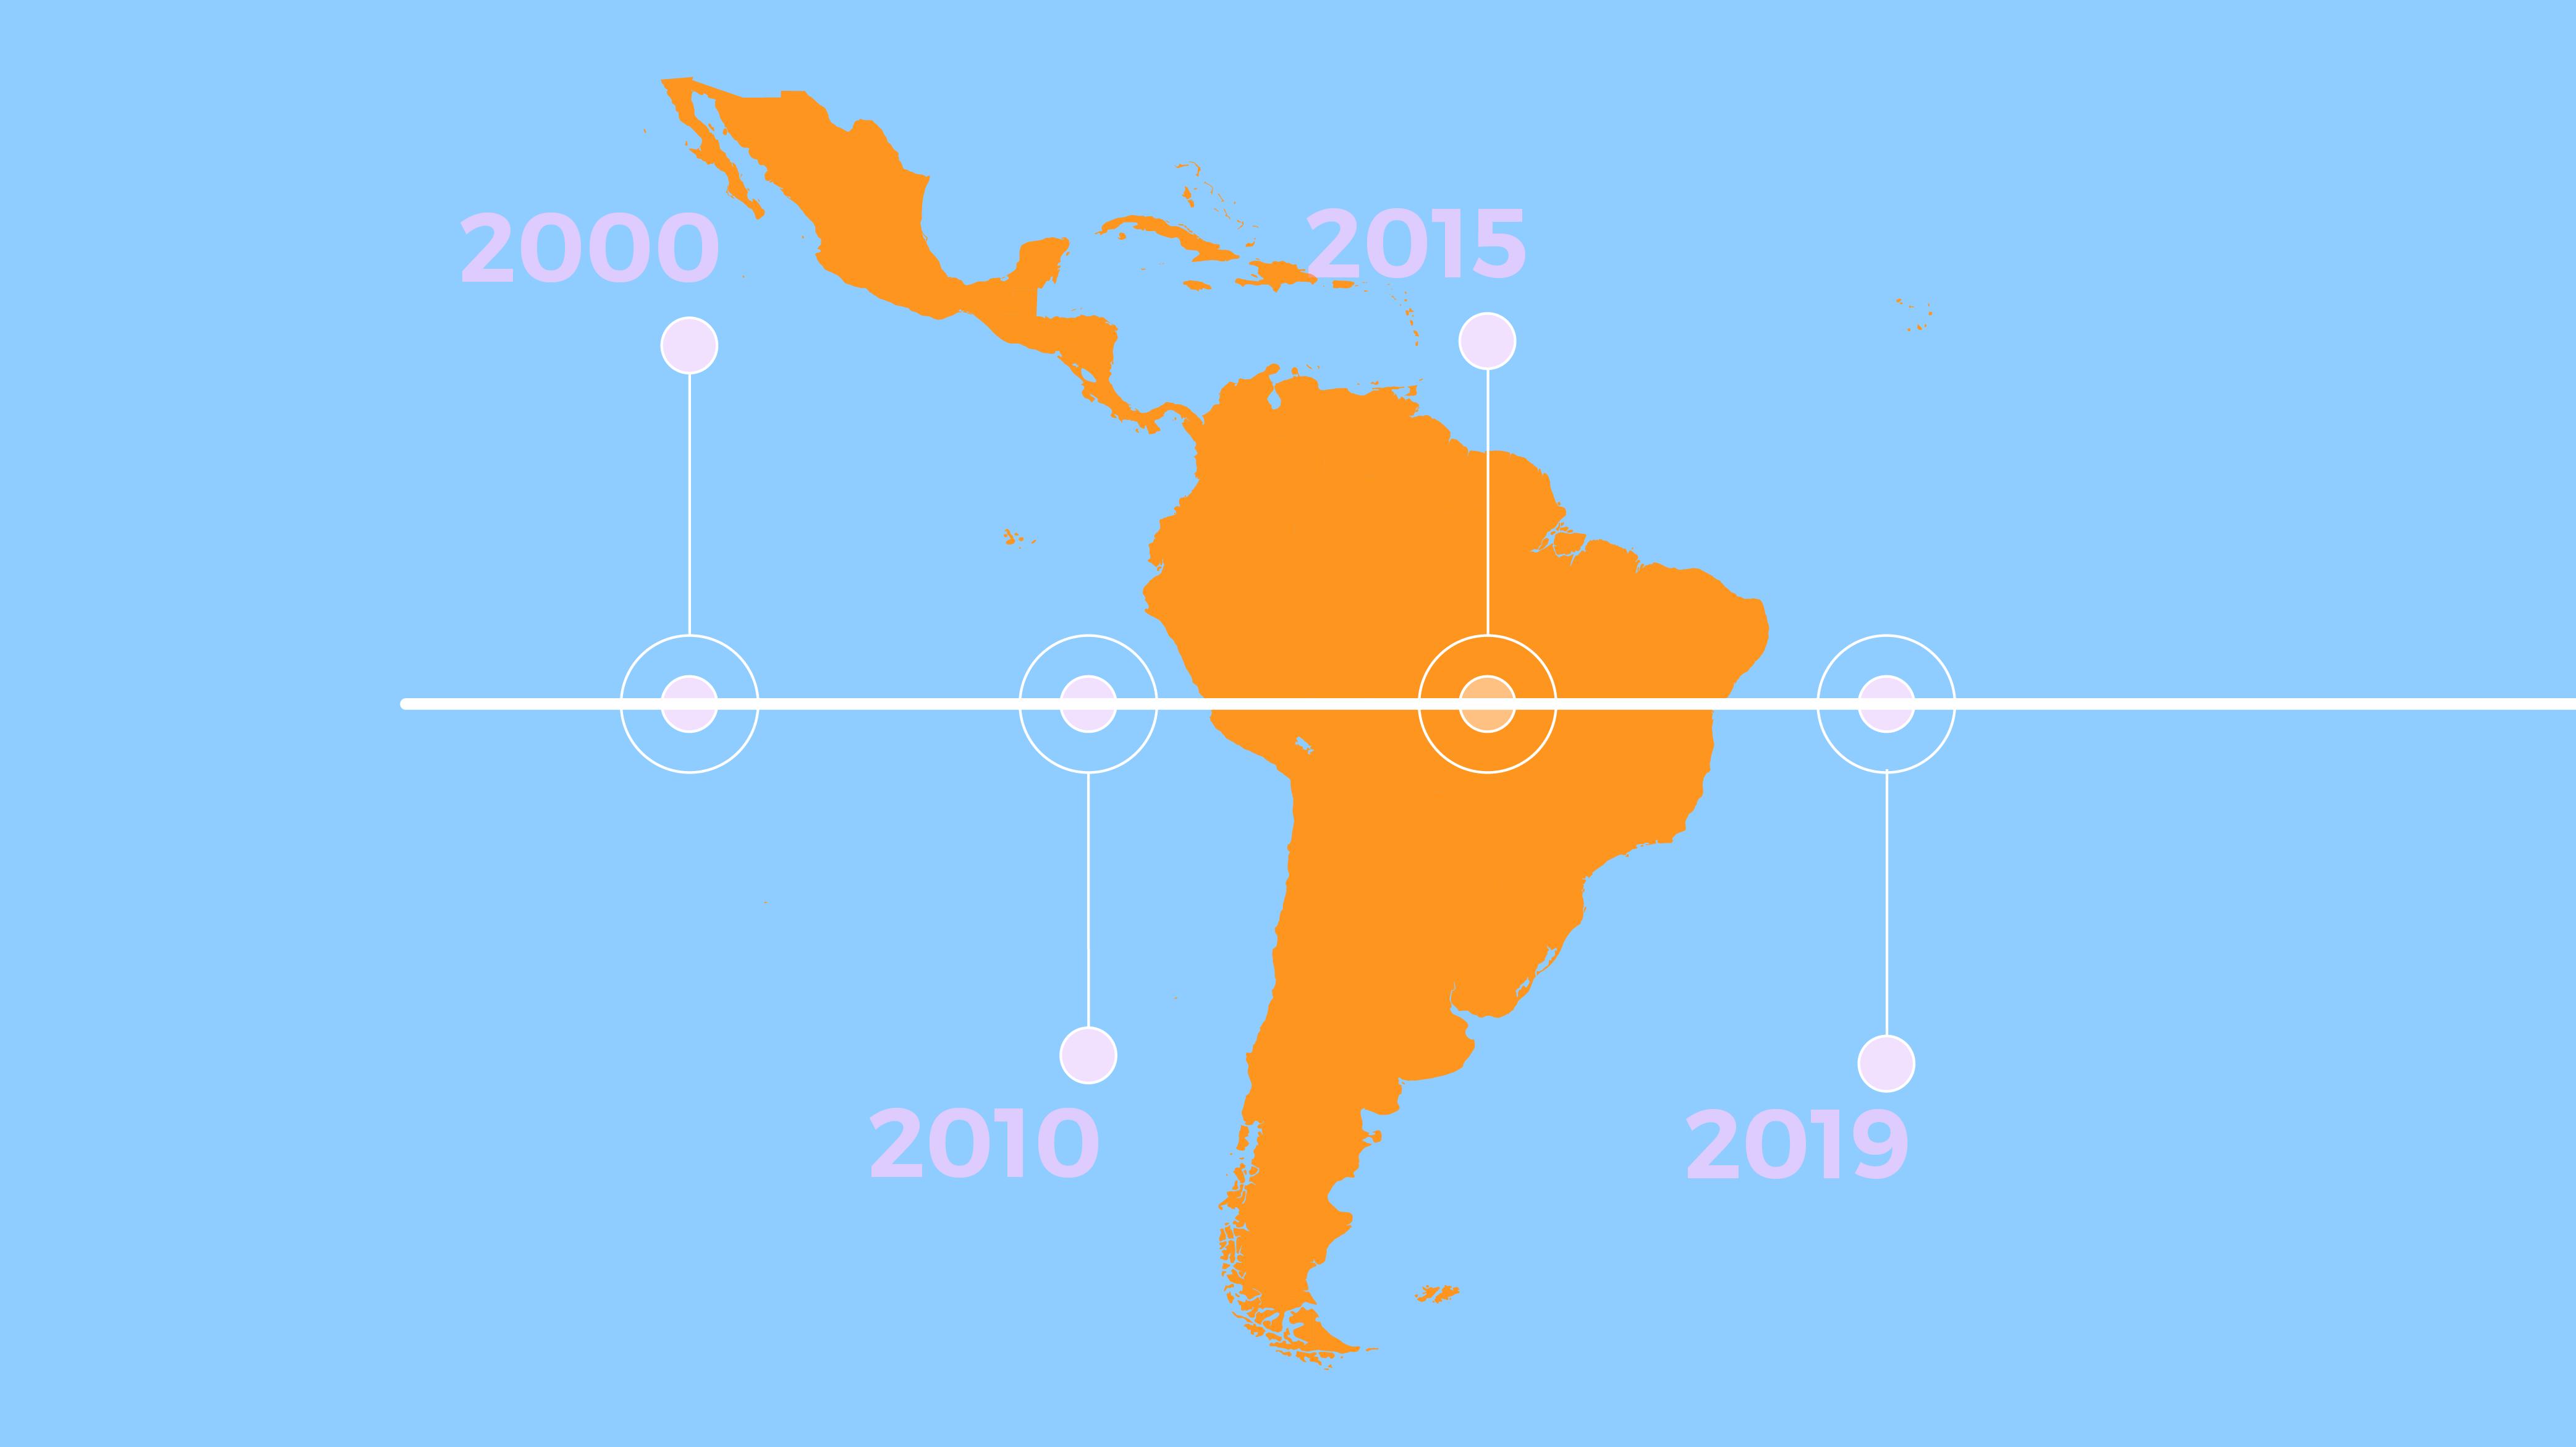 latinoamerica-a-vuelo-de-pajaro_mesa-de-trabajo-1